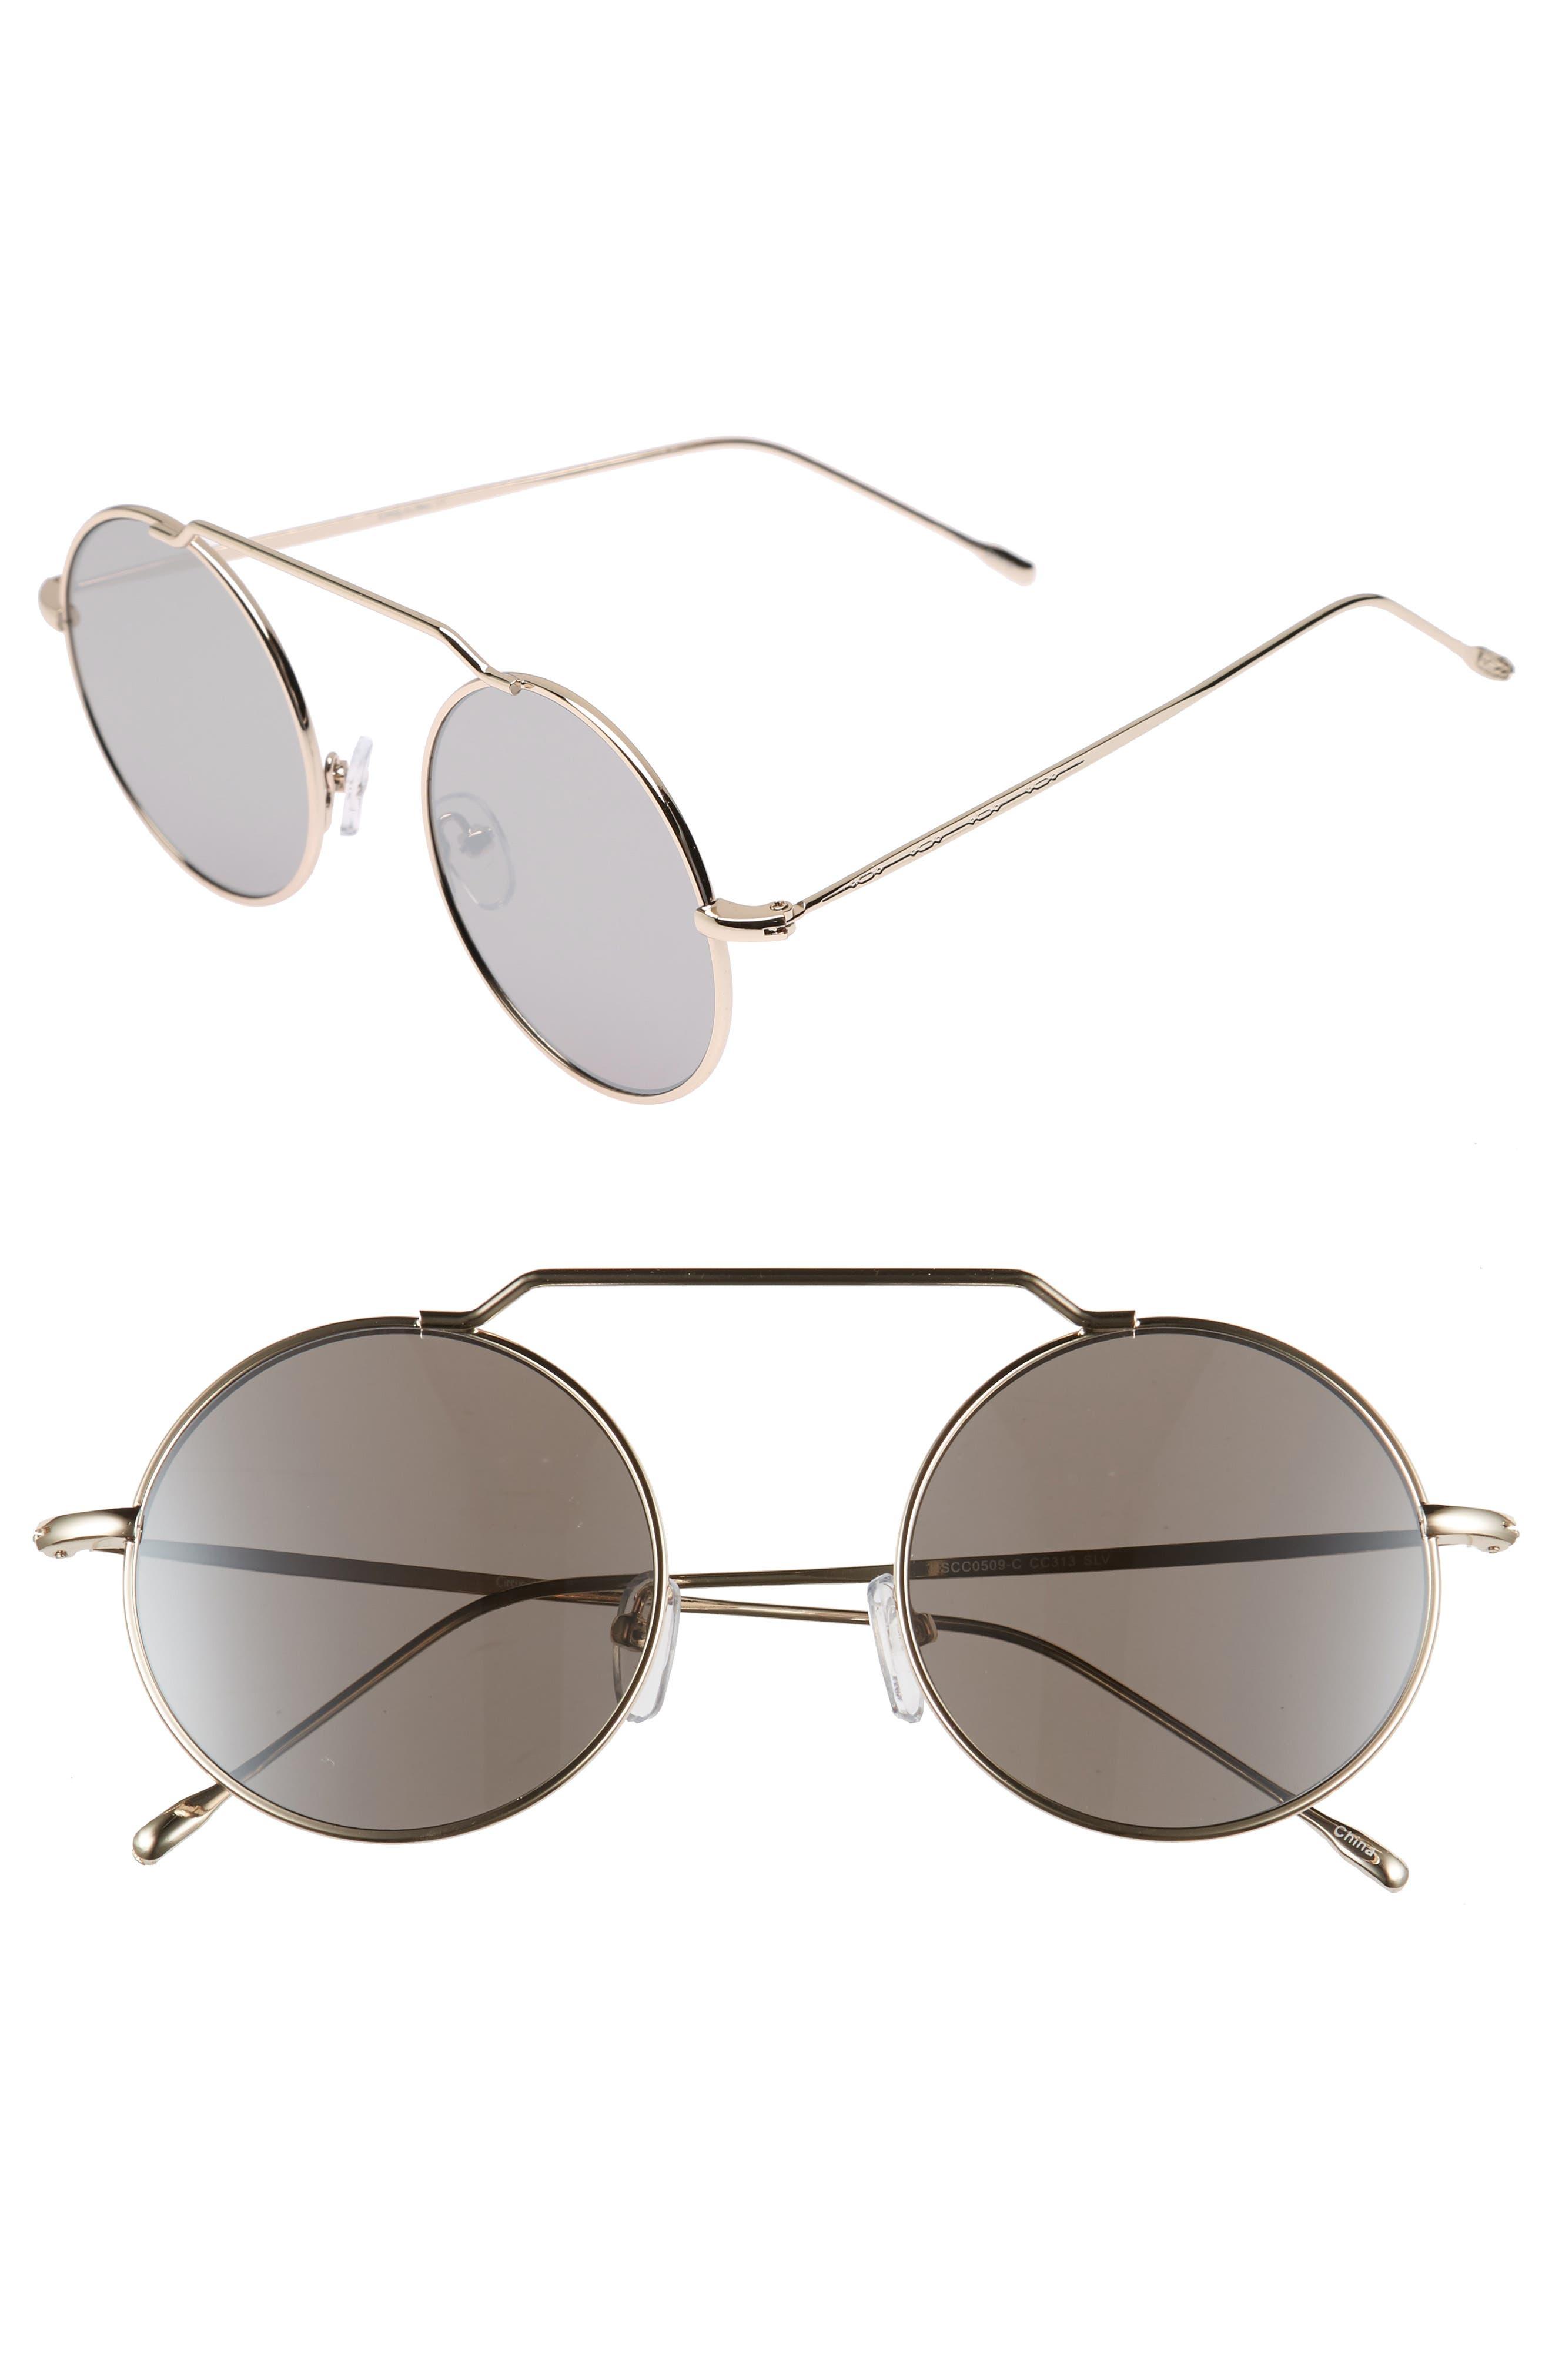 51mm Brow Bar Round Sunglasses,                             Main thumbnail 2, color,